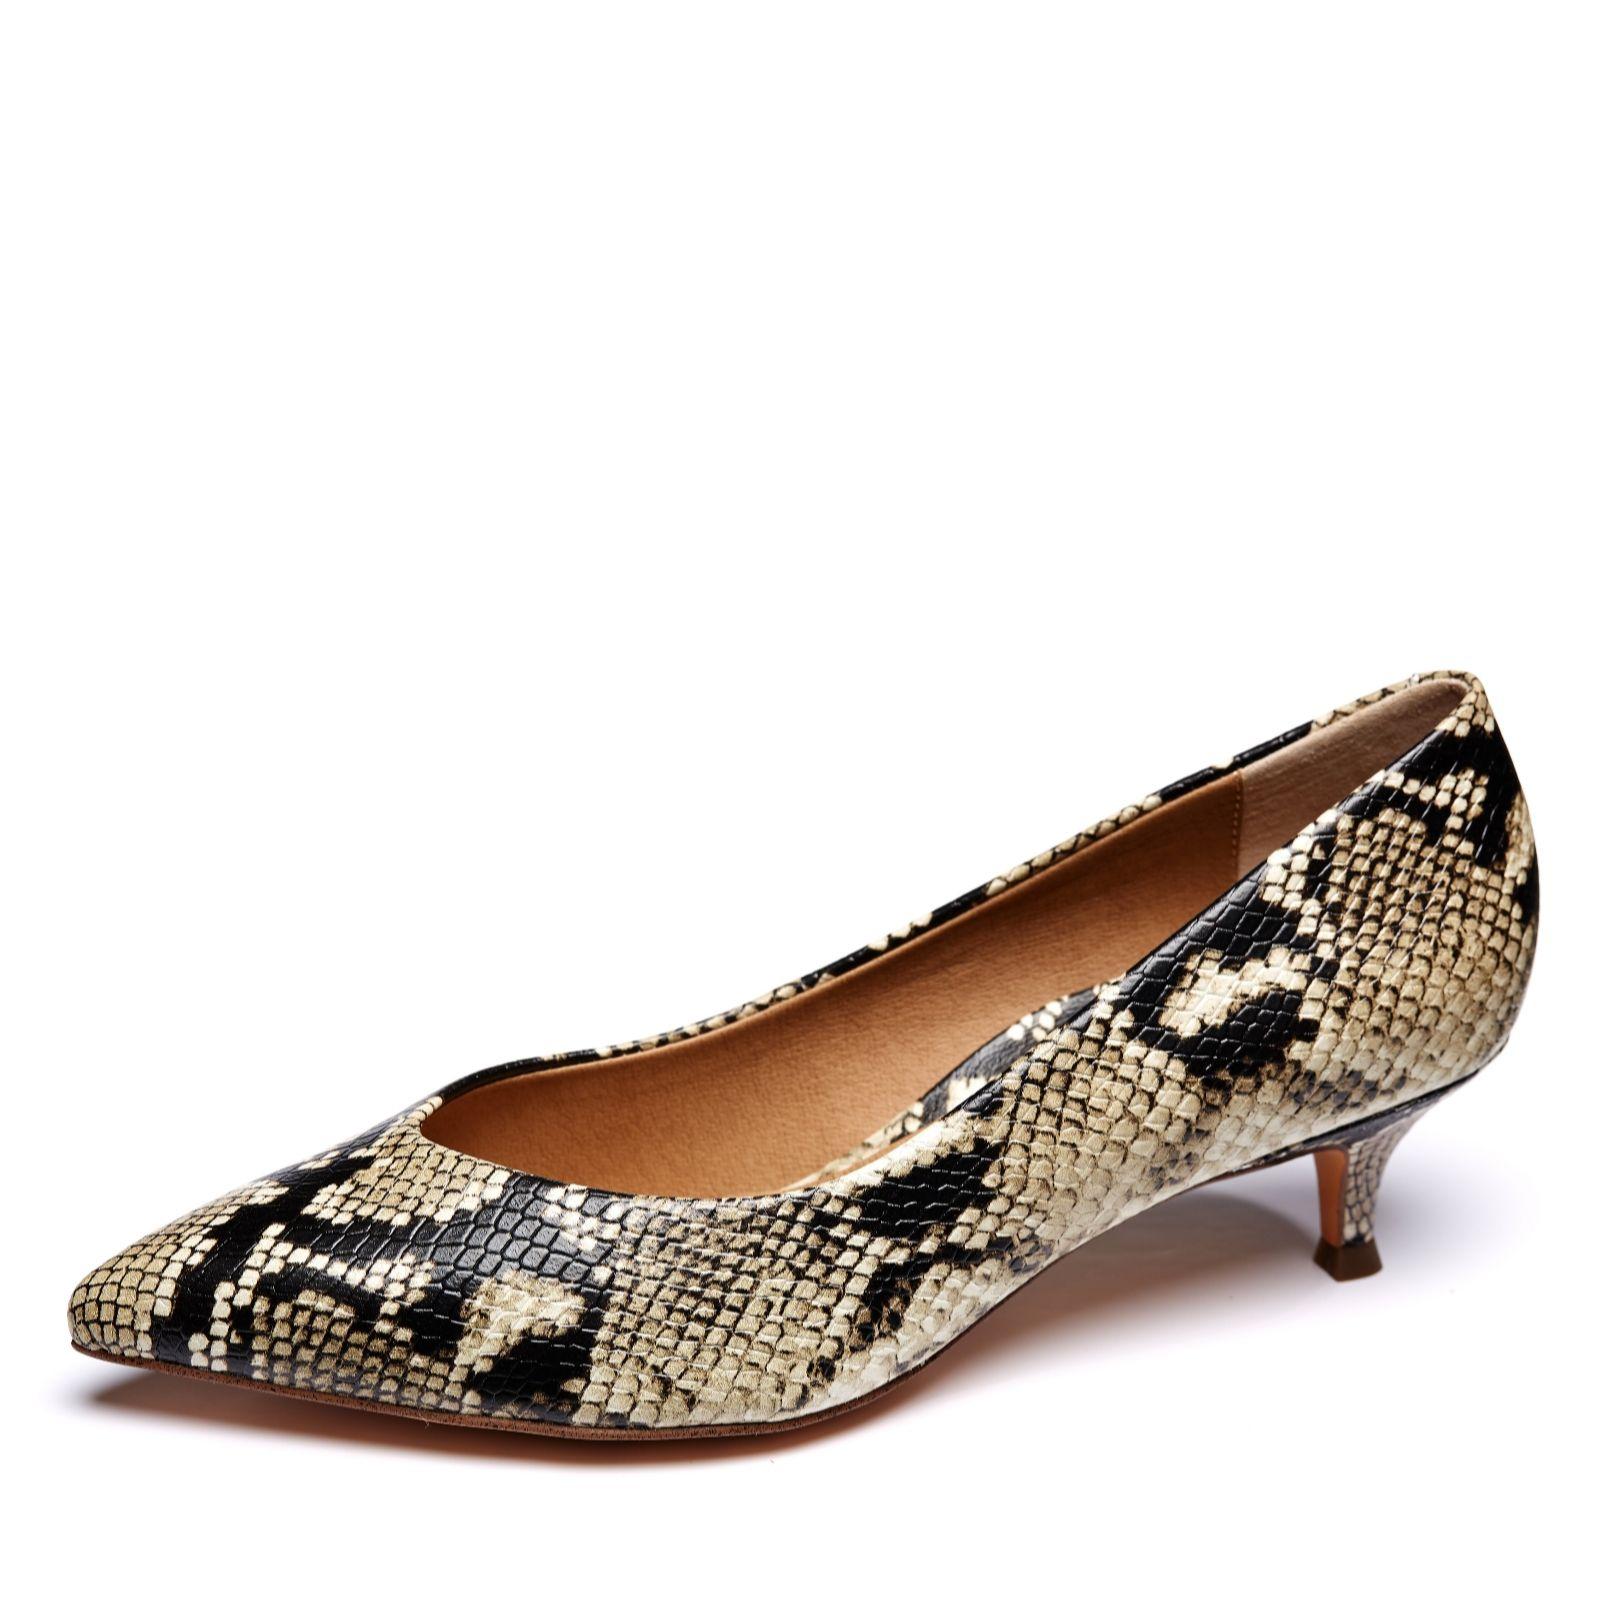 75612ee55e6e Vionic Orthotic Josie Court Shoe w/ FMT Technology - QVC UK